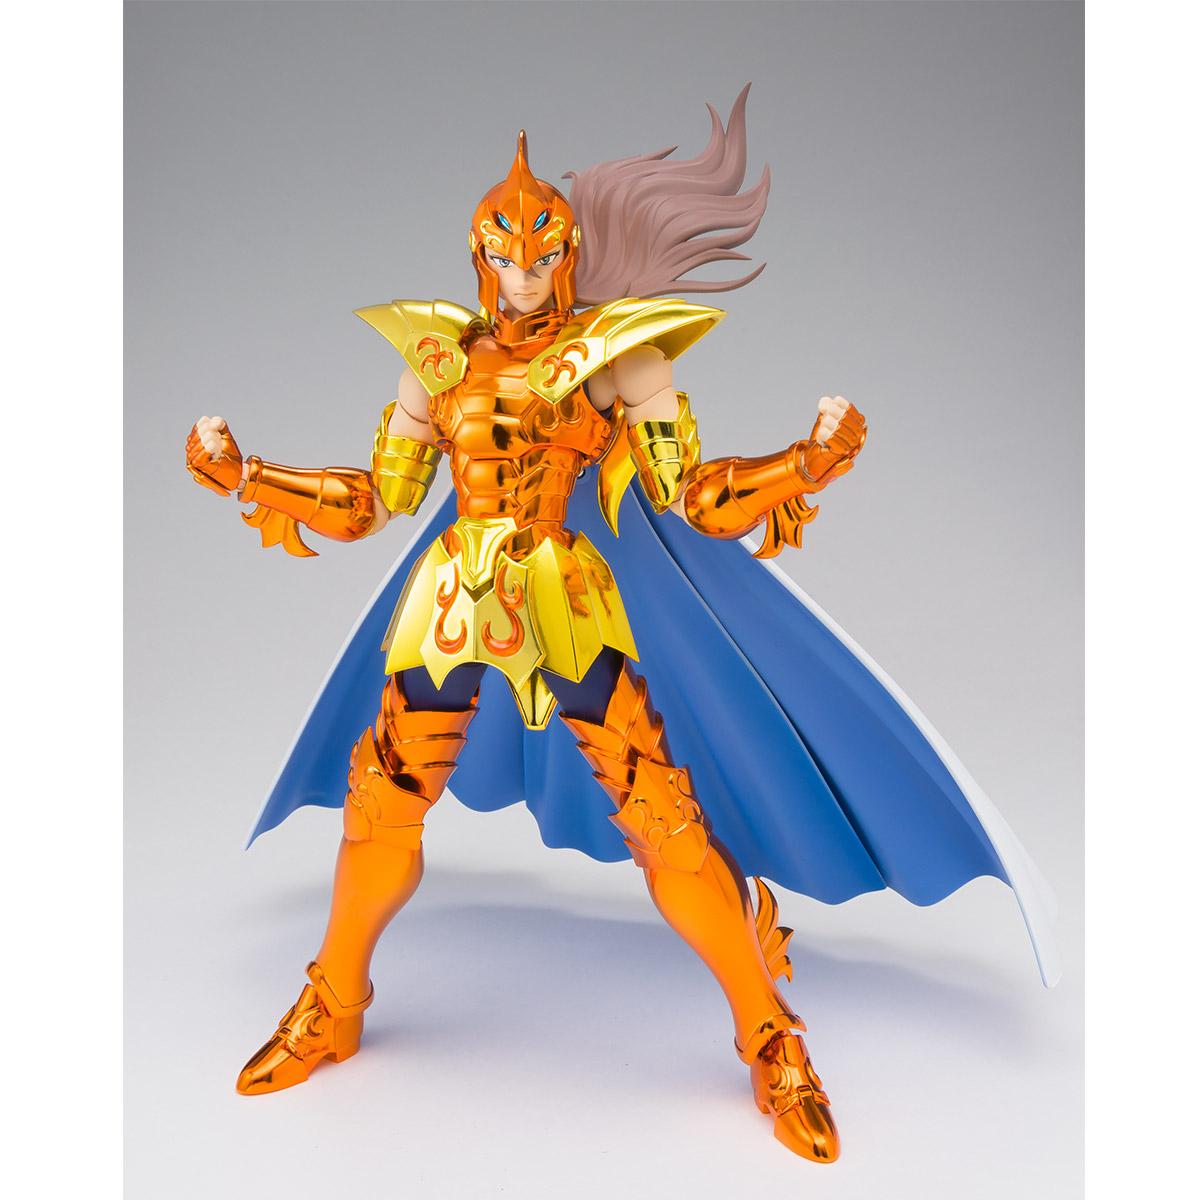 Saint Cloth Myth EX Seahorse Bian General Figure Premium Bandai Japan